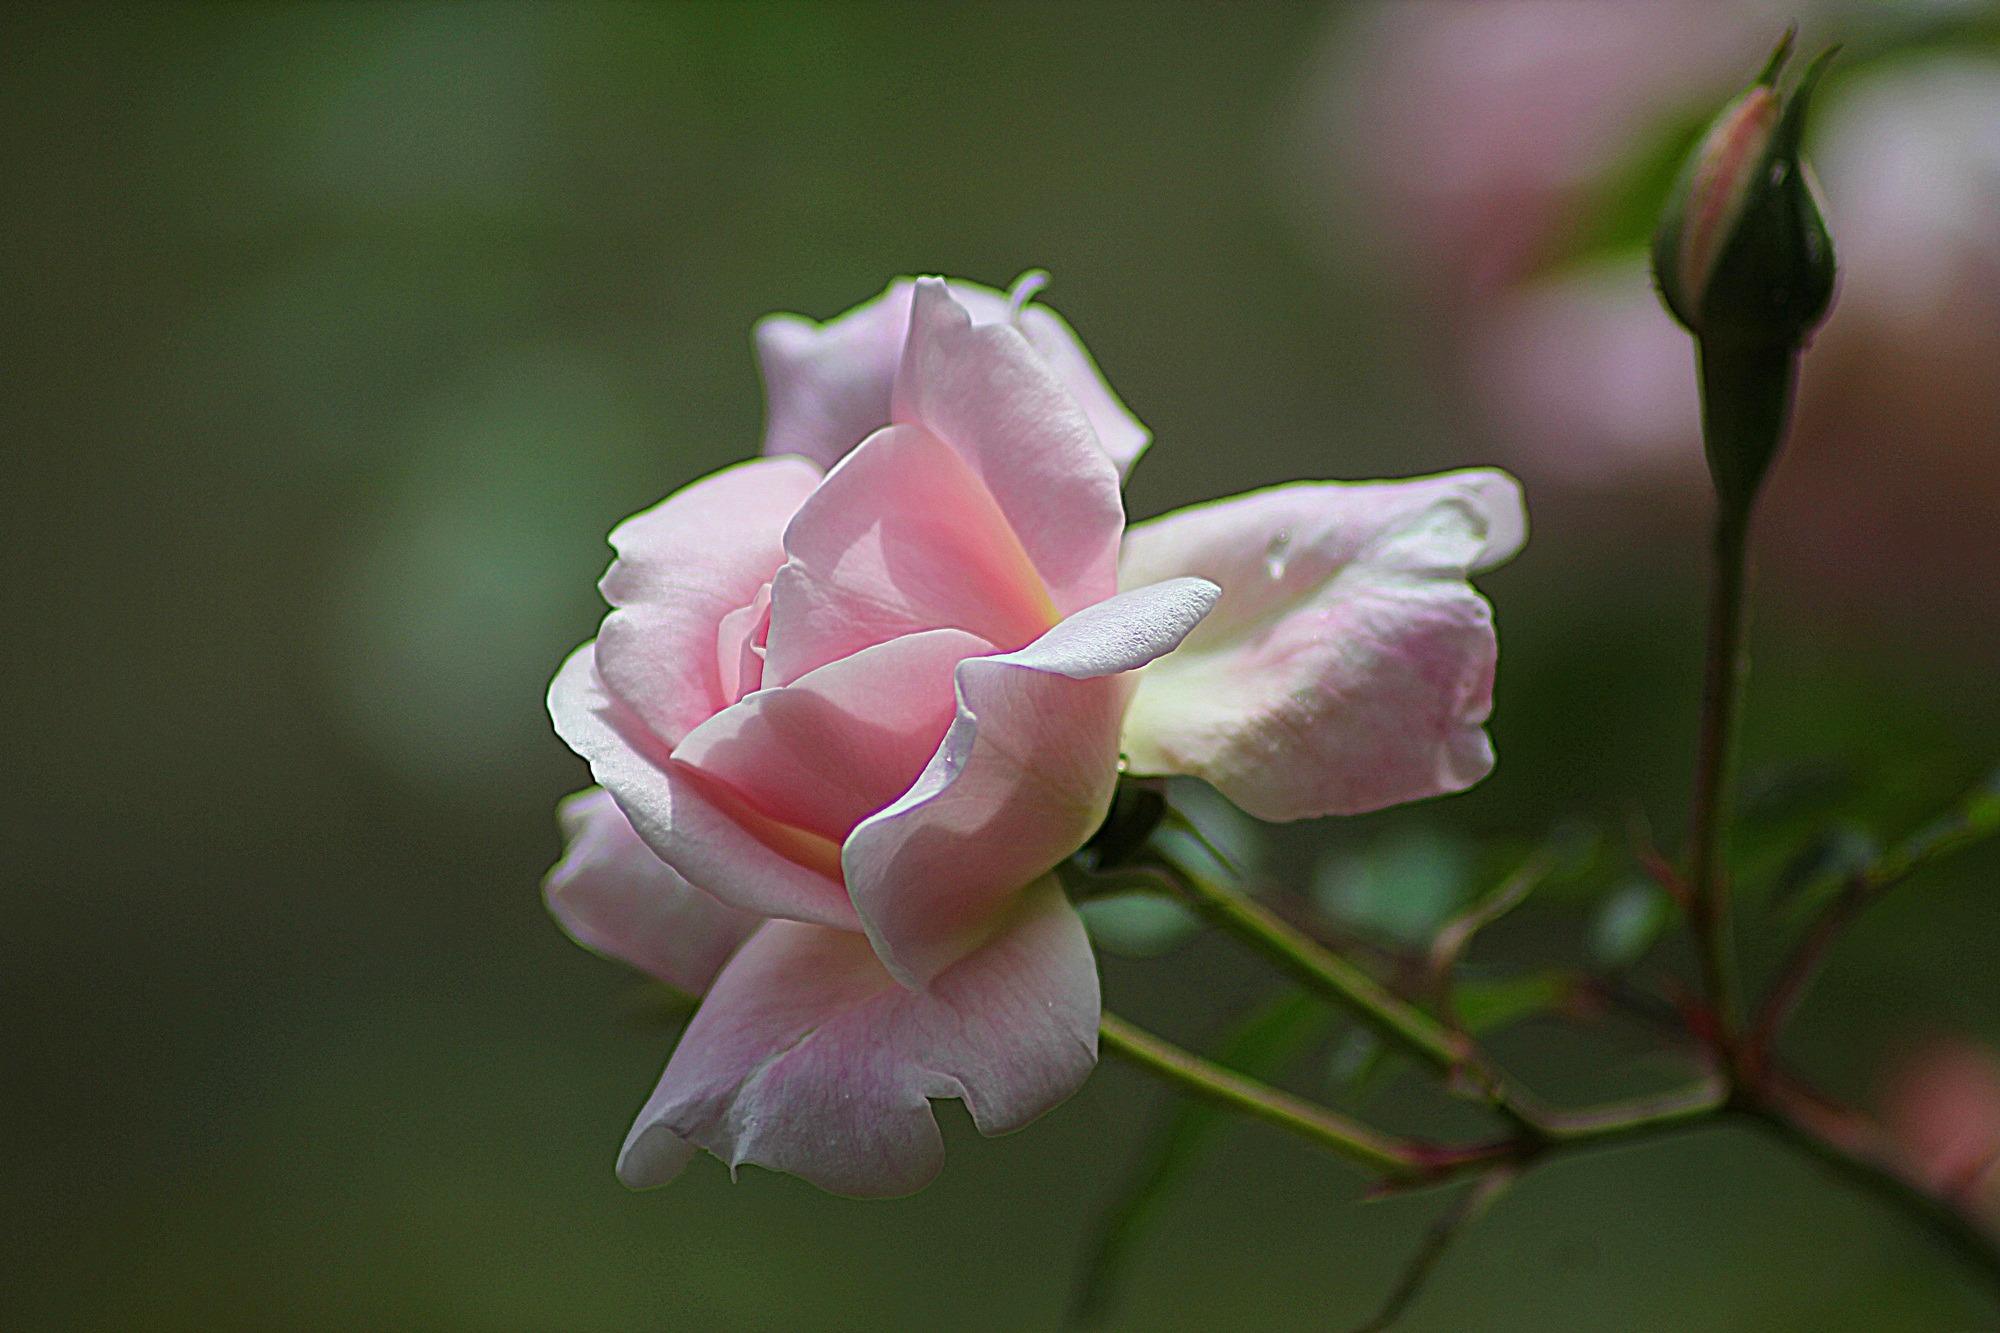 Pink Iphone X Wallpaper Orange Rose Flower In Bloom During Daytime 183 Free Stock Photo